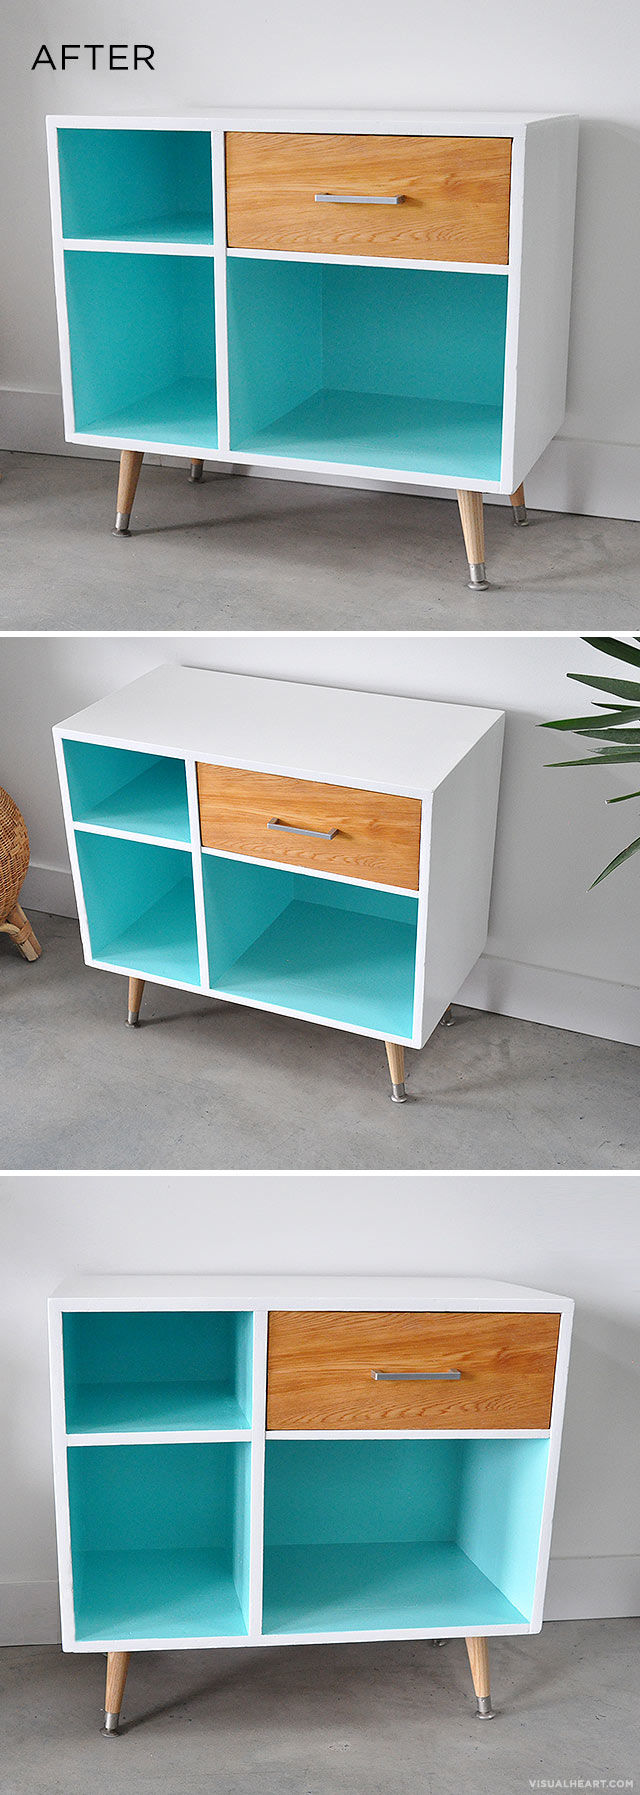 8 Mid century Modern Shelf via Simphome